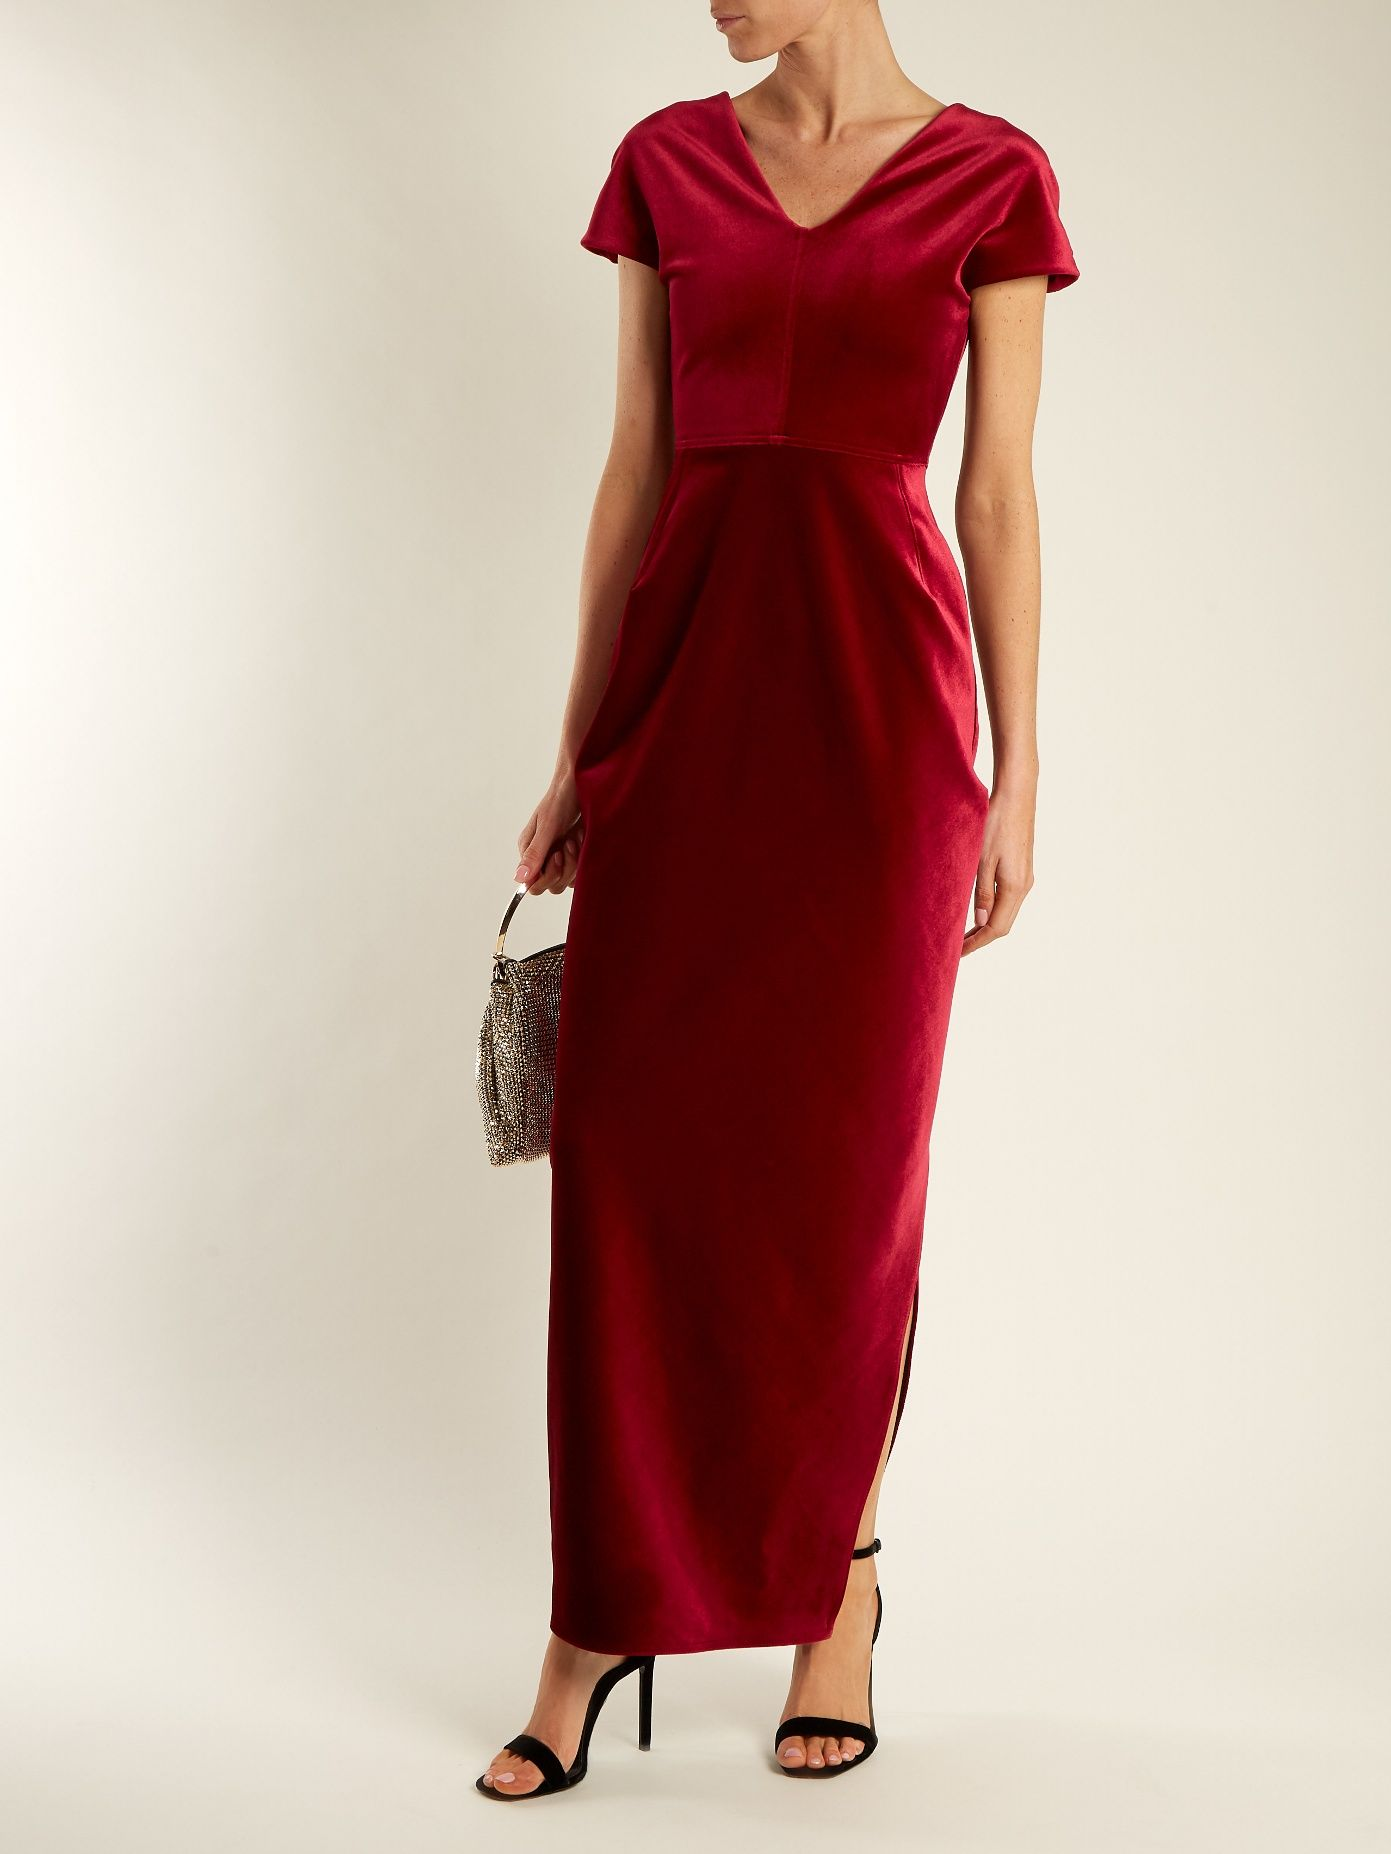 Tamara Dartelle V-neck velvet gown Emilio de la Morena P73htJE